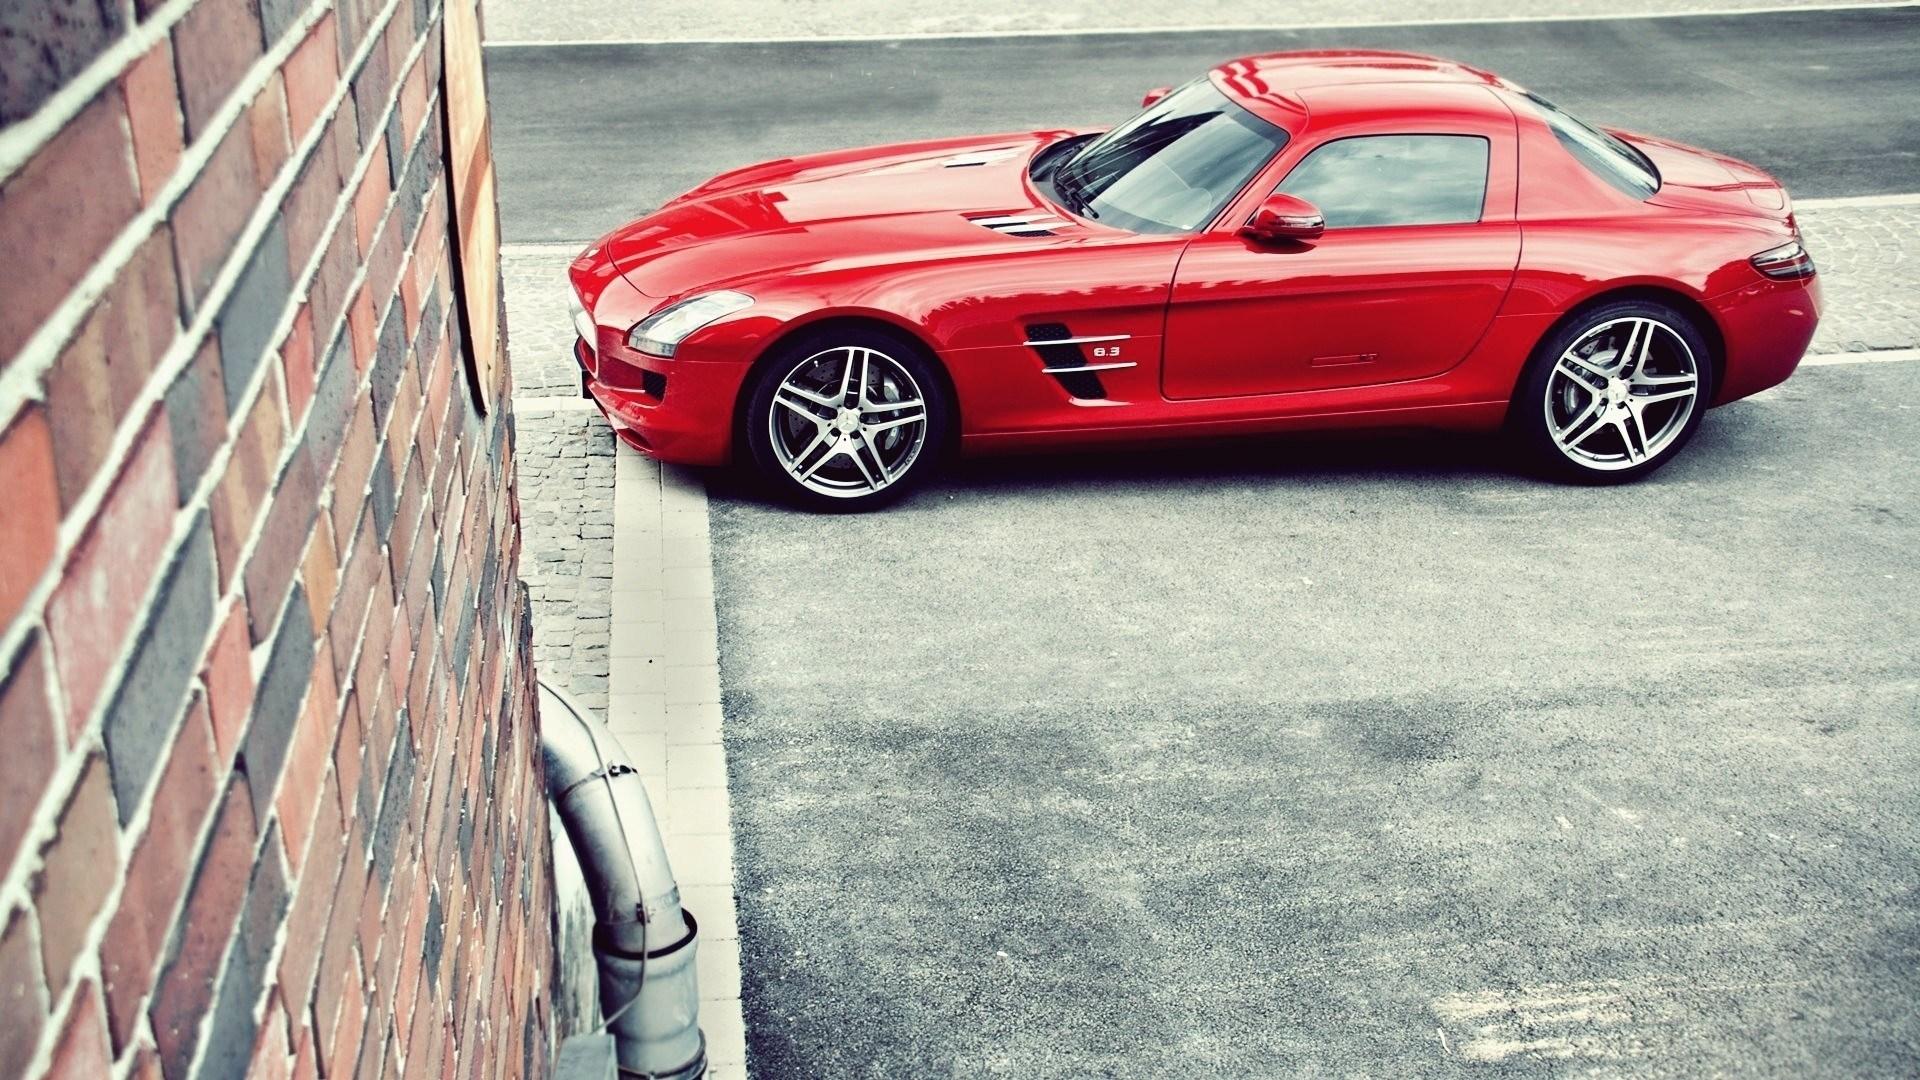 Mercedes-Benz SLS AMG Red Car Parking